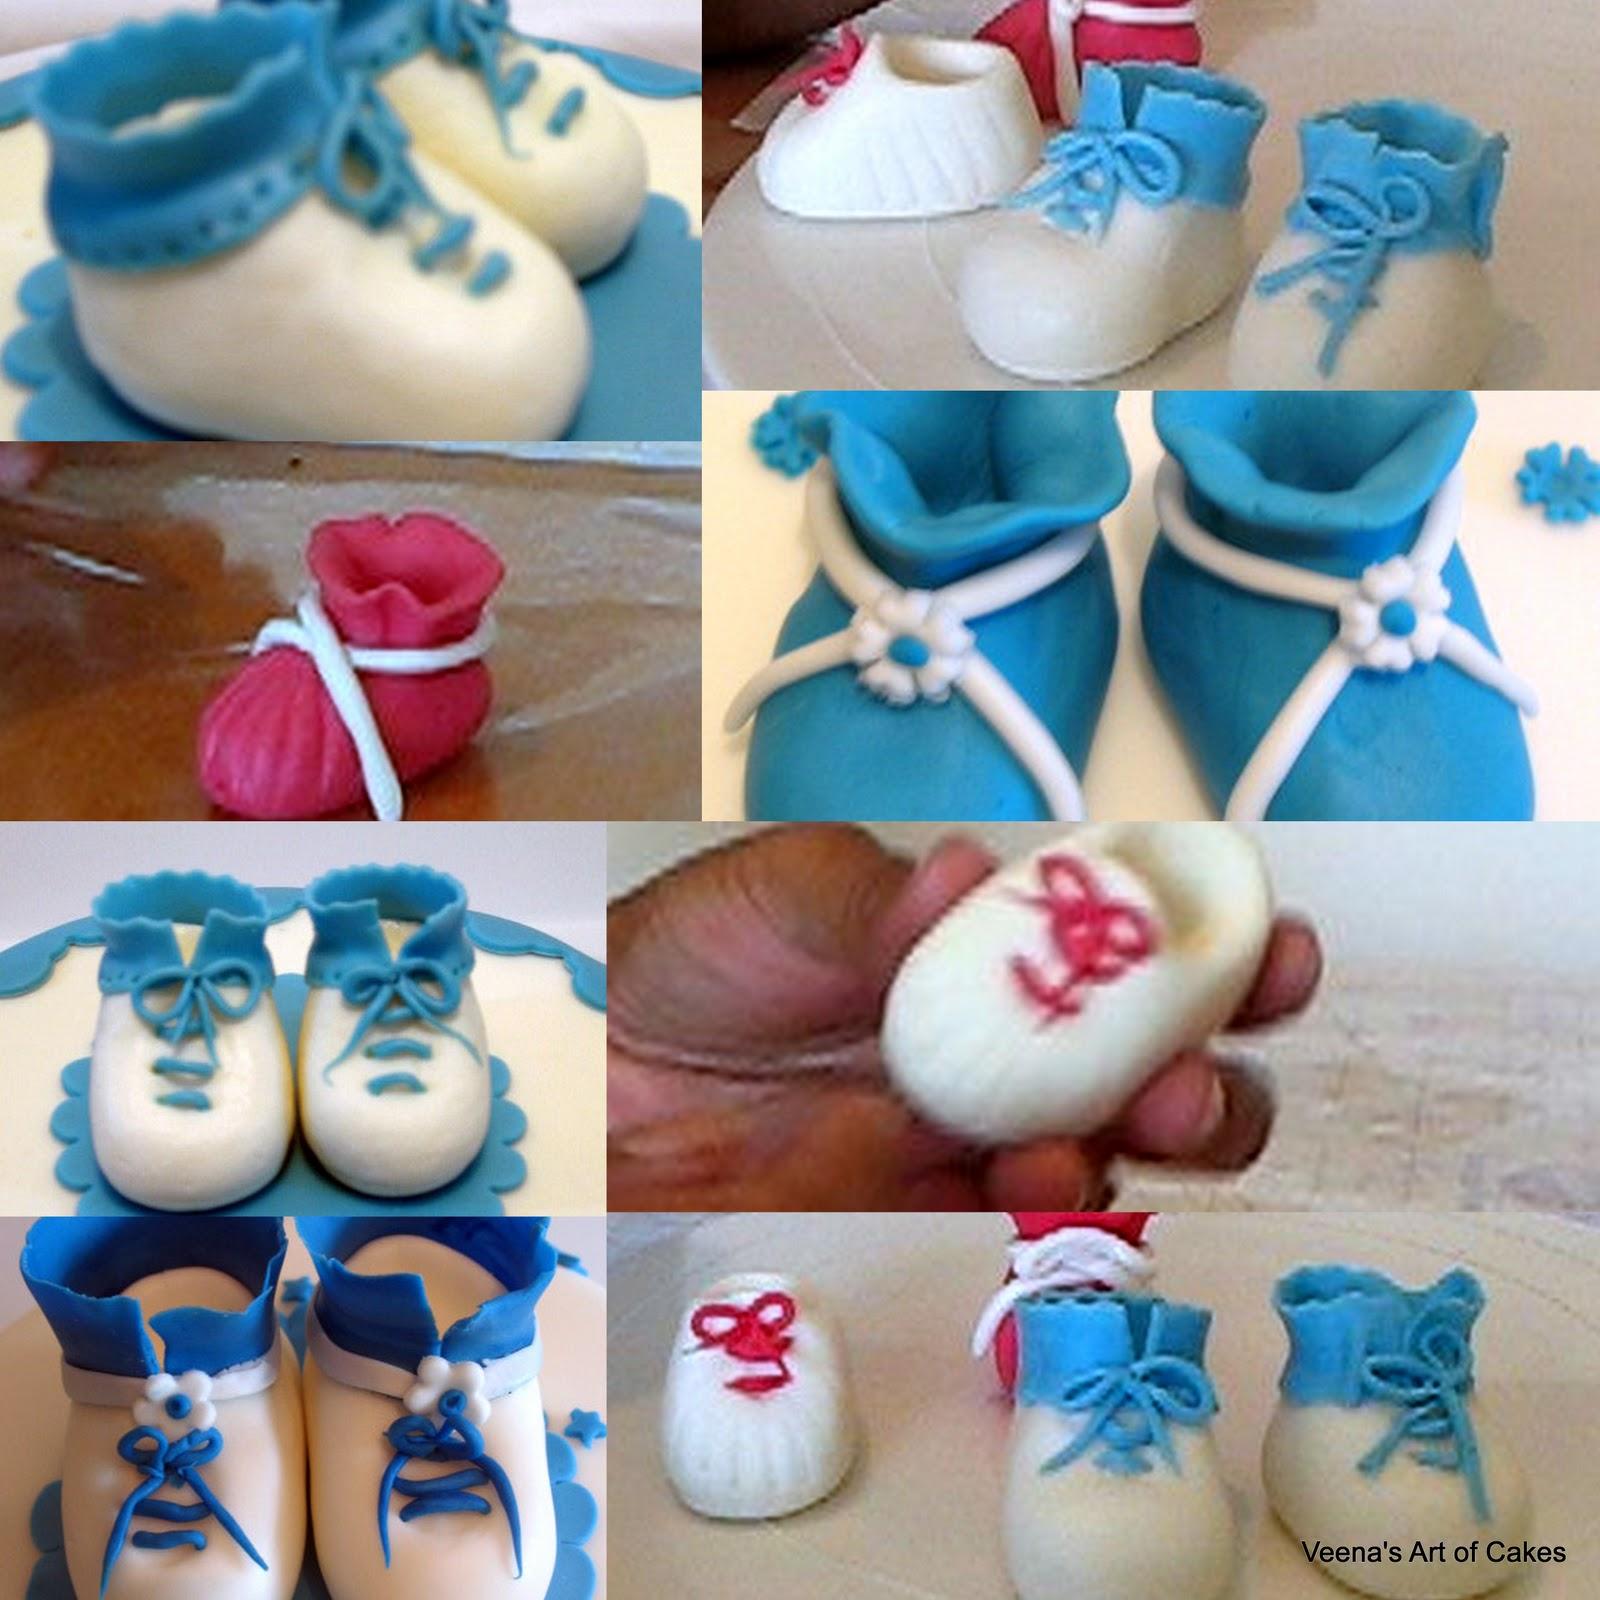 How to make a gumpaste baby shoes cakecentral. Com.